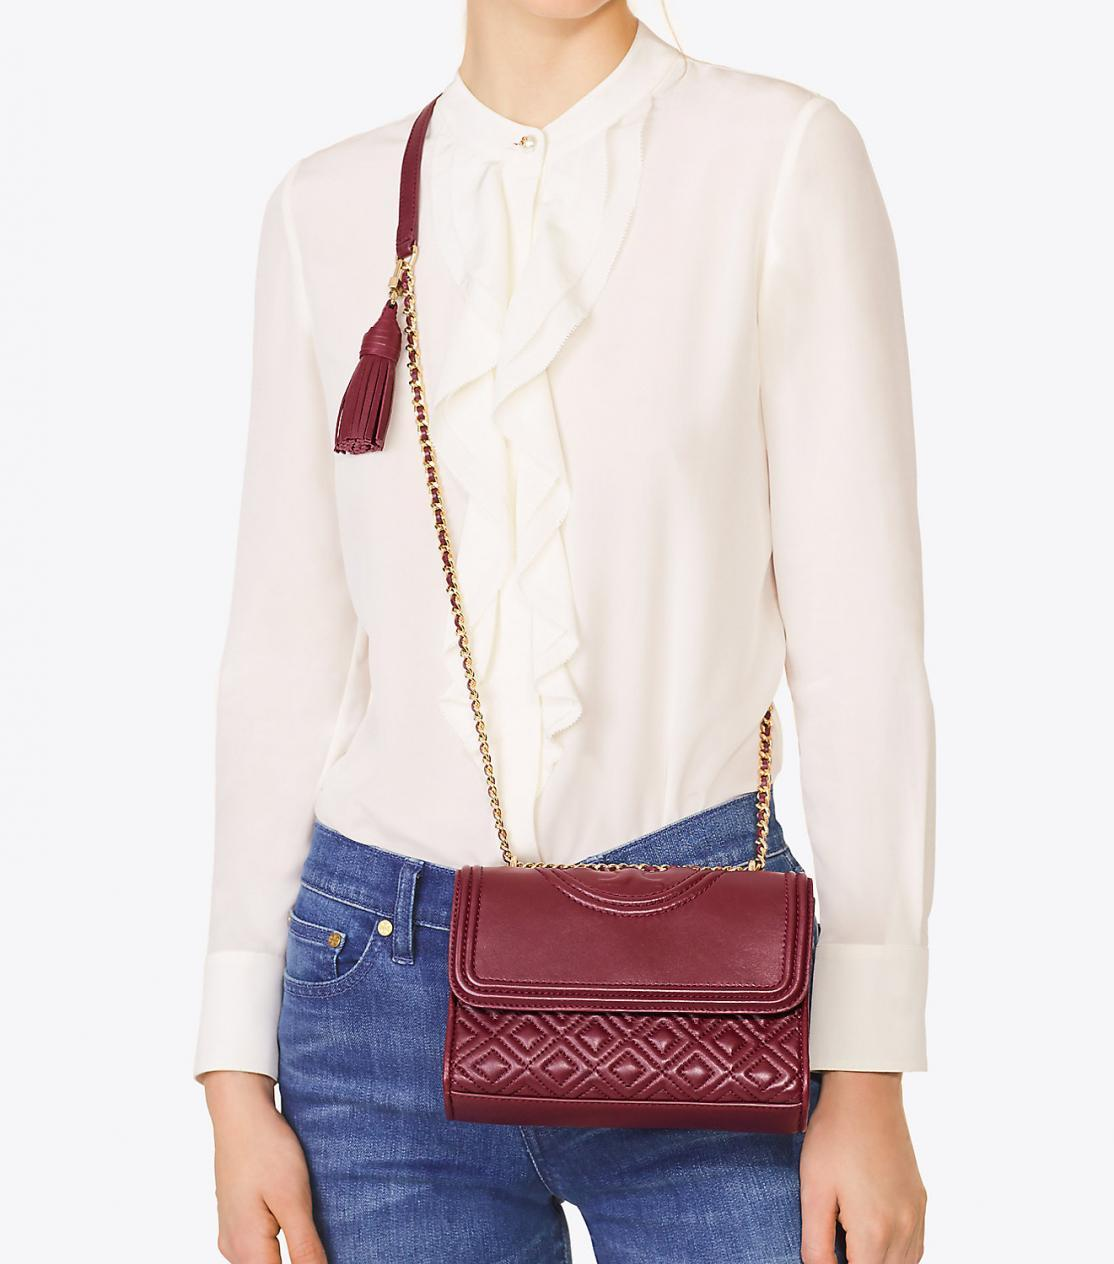 00a1399d8be7 New Original Tory Burch Fleming Small Convertible Shoulder Hand Bag For  Women